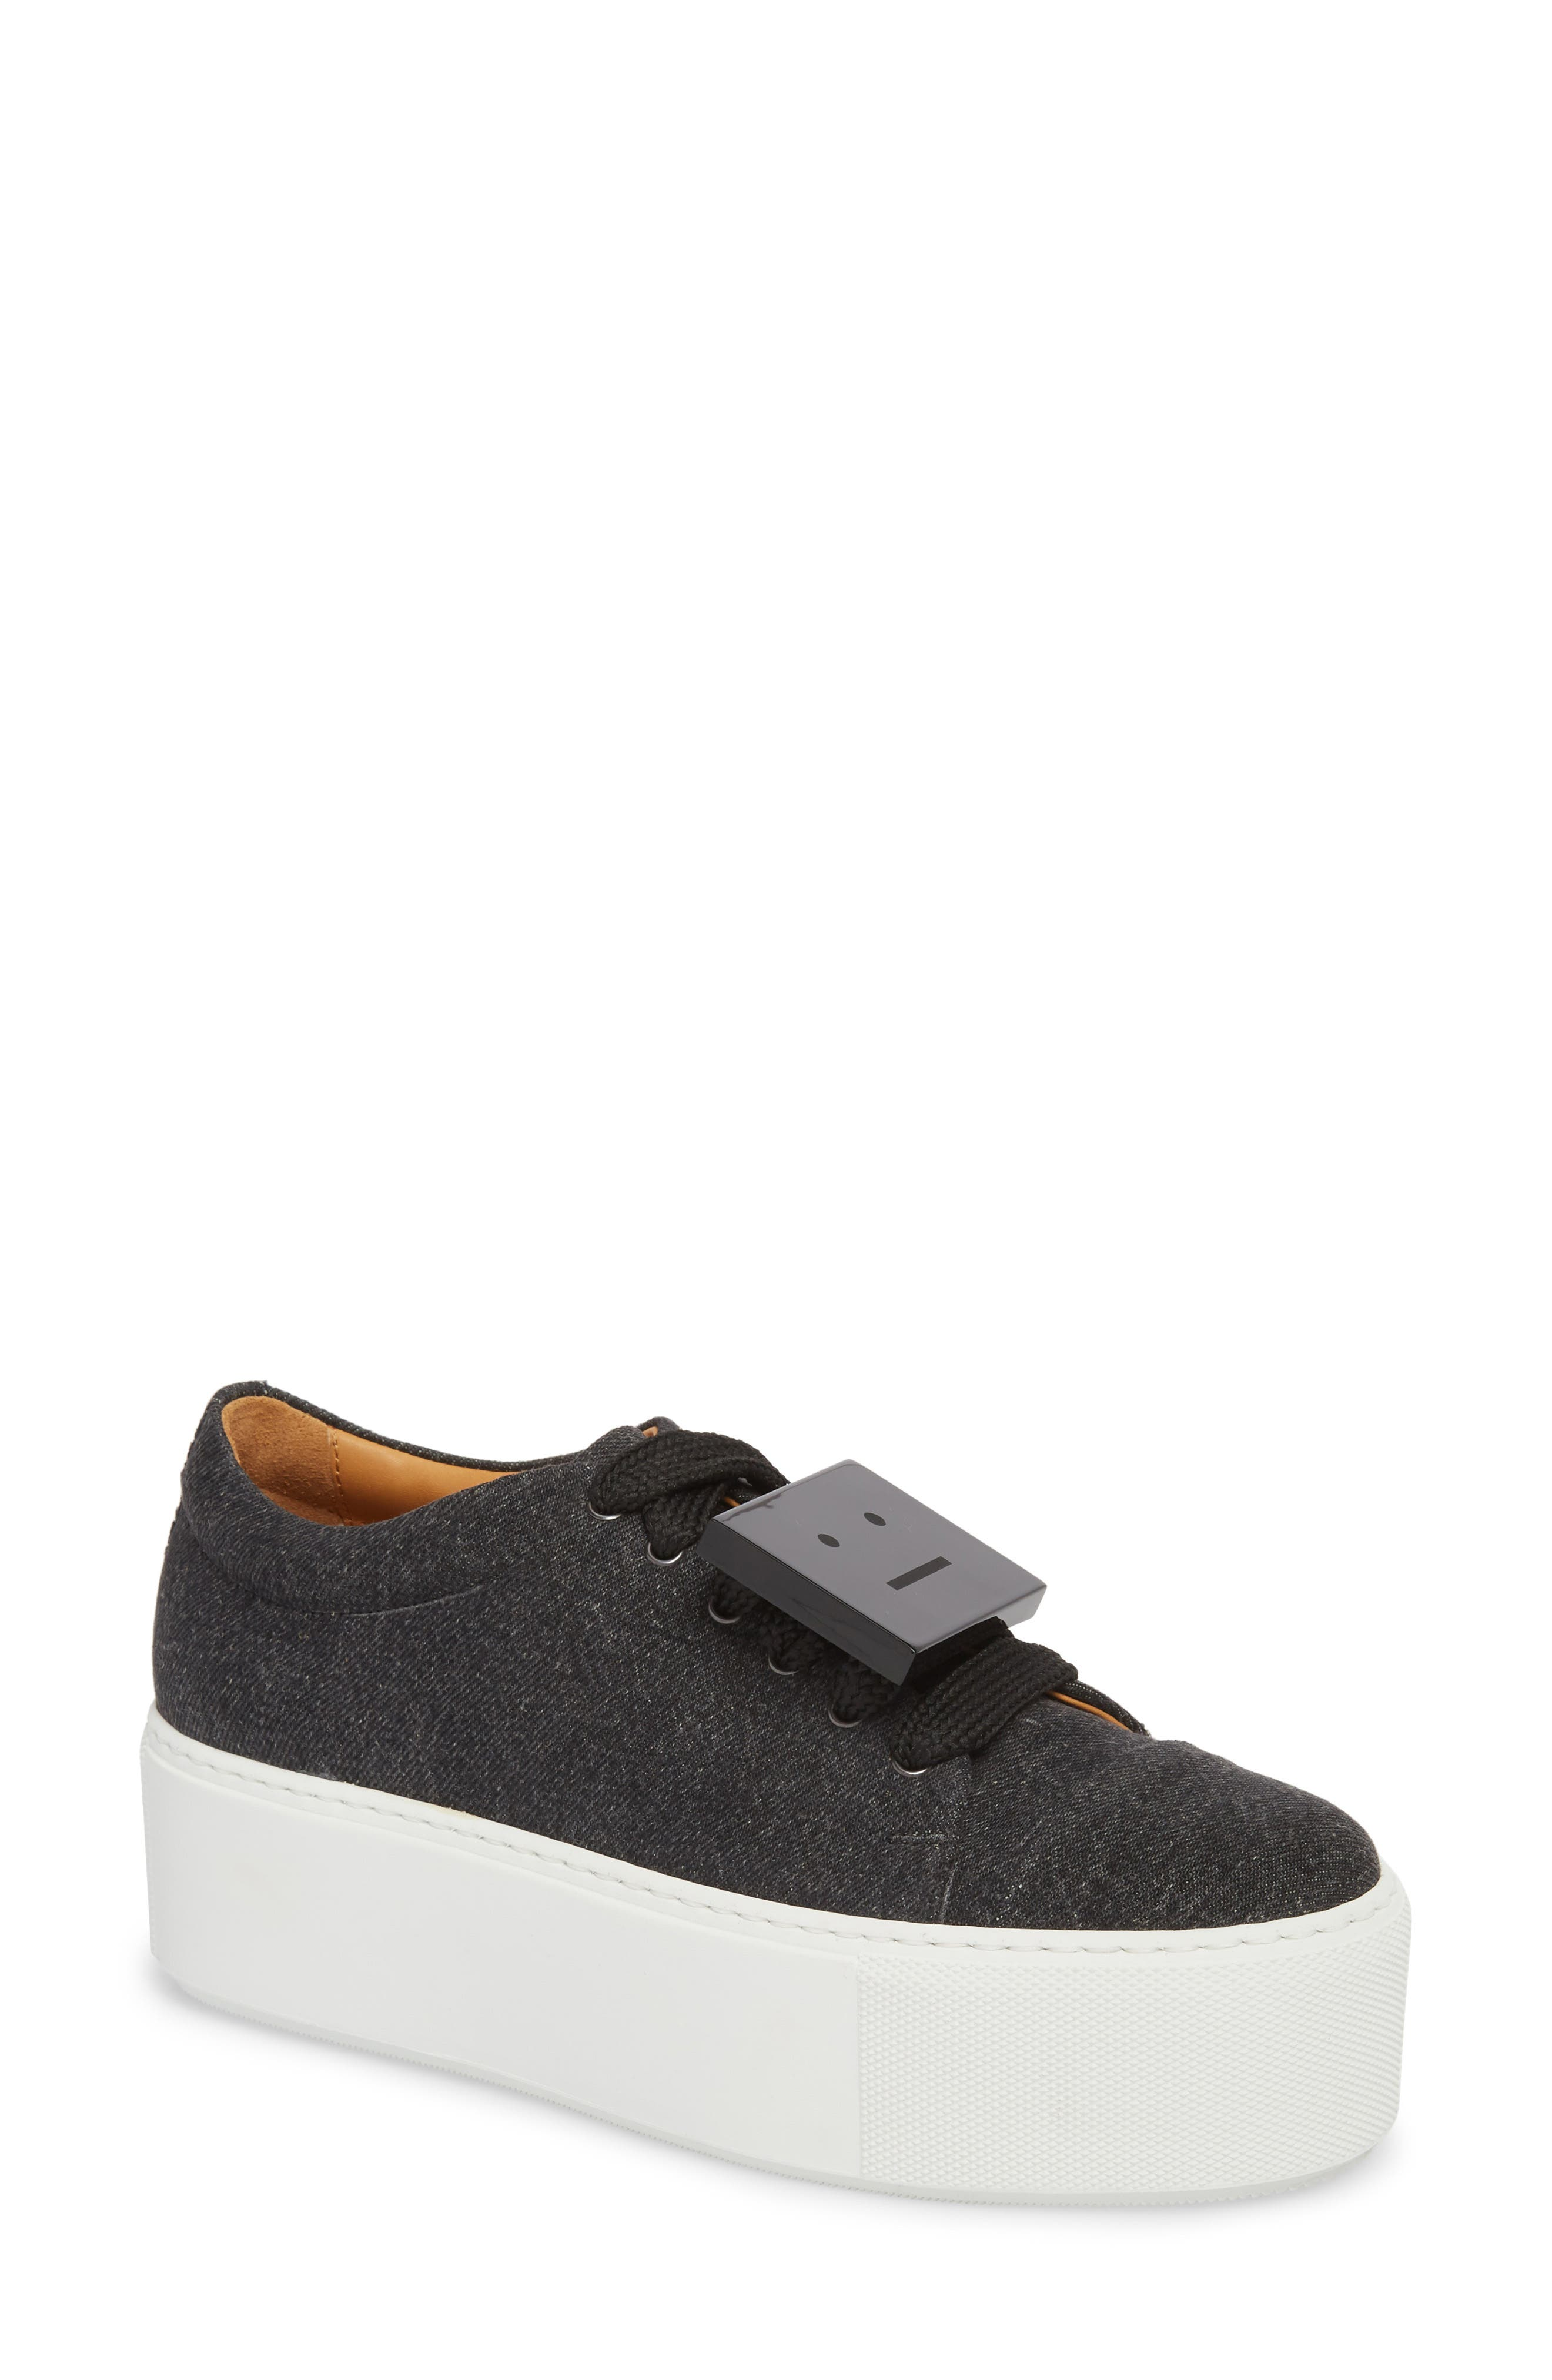 Drihanna Denim Platform Sneaker,                             Main thumbnail 1, color,                             001